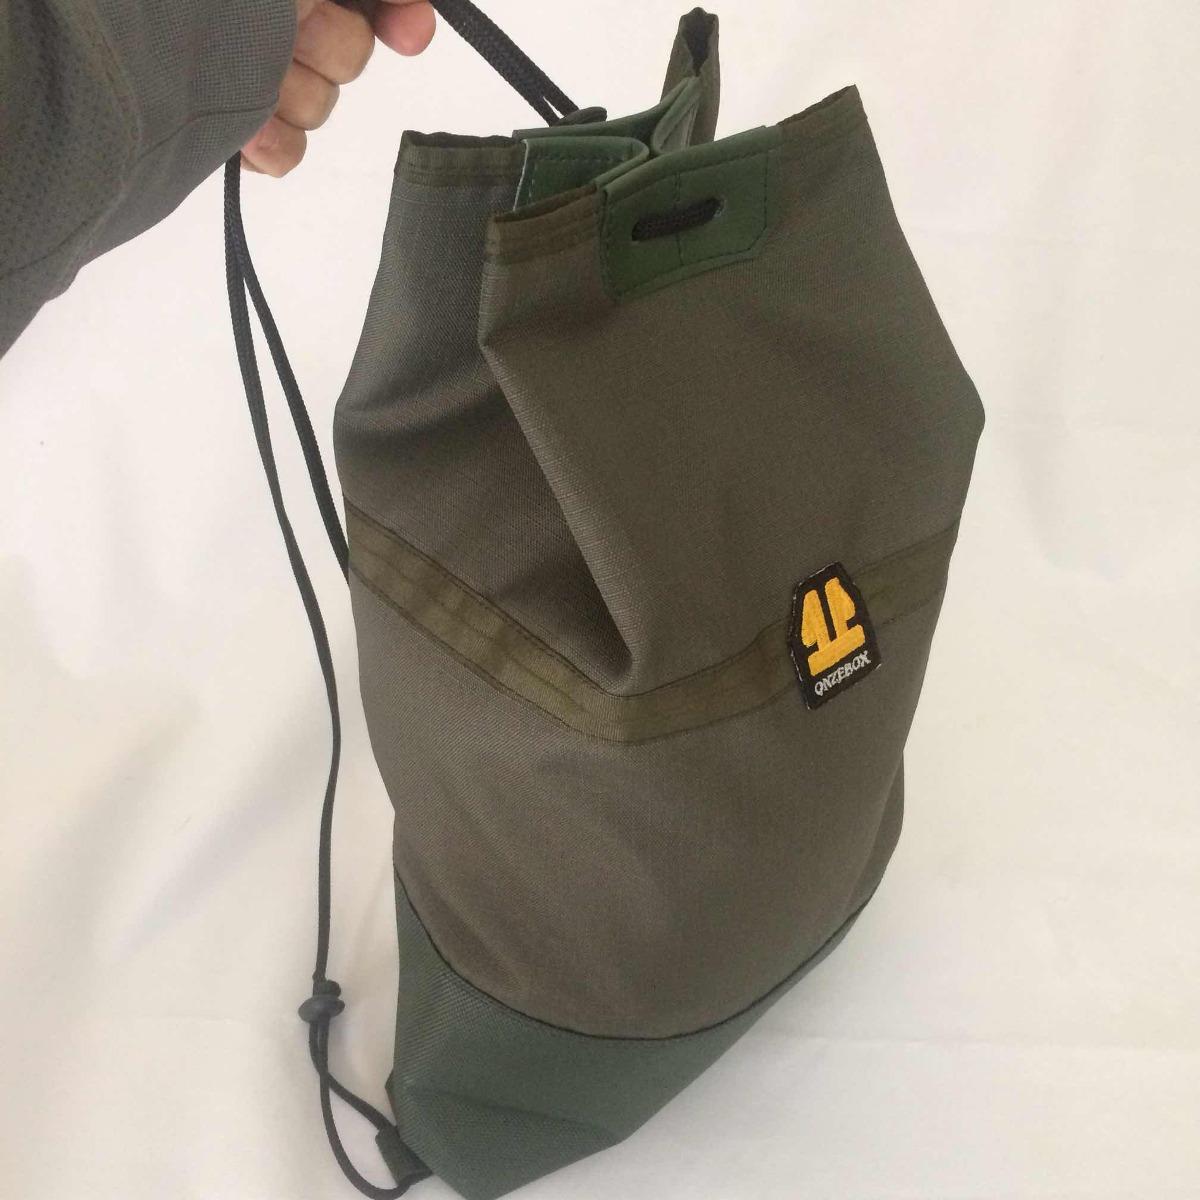 ca775d8bb Mochila Tipo Saco / Bag Camp / Sobrevivência / Camping / Edc - R ...